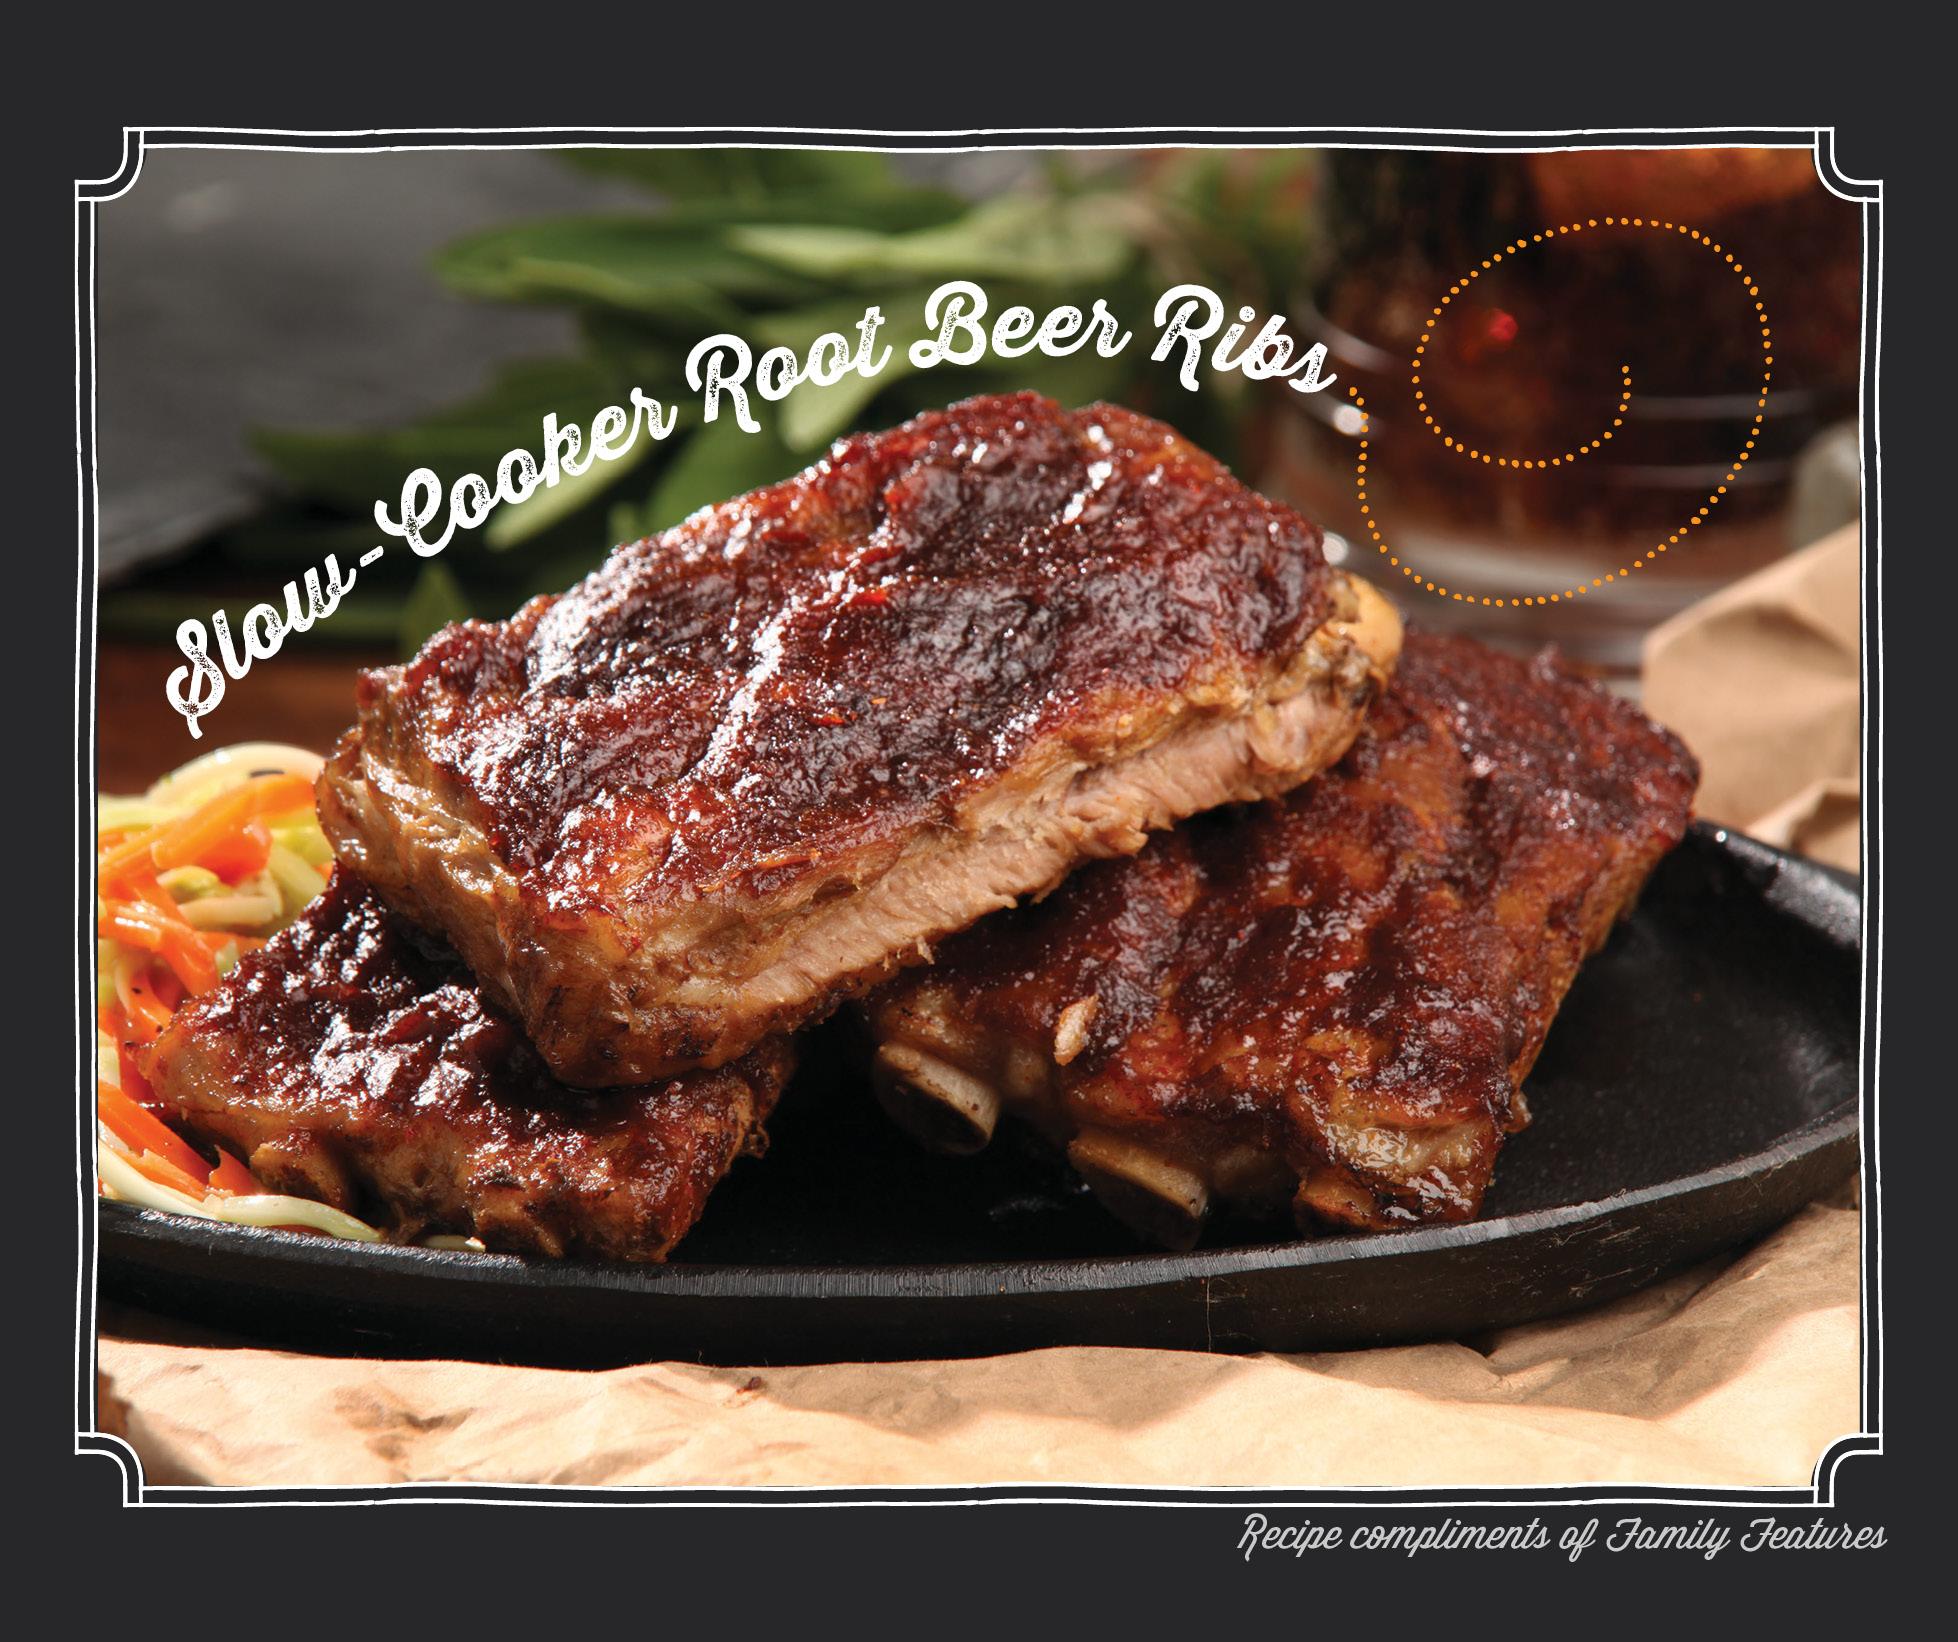 10 October Root Beer Ribs